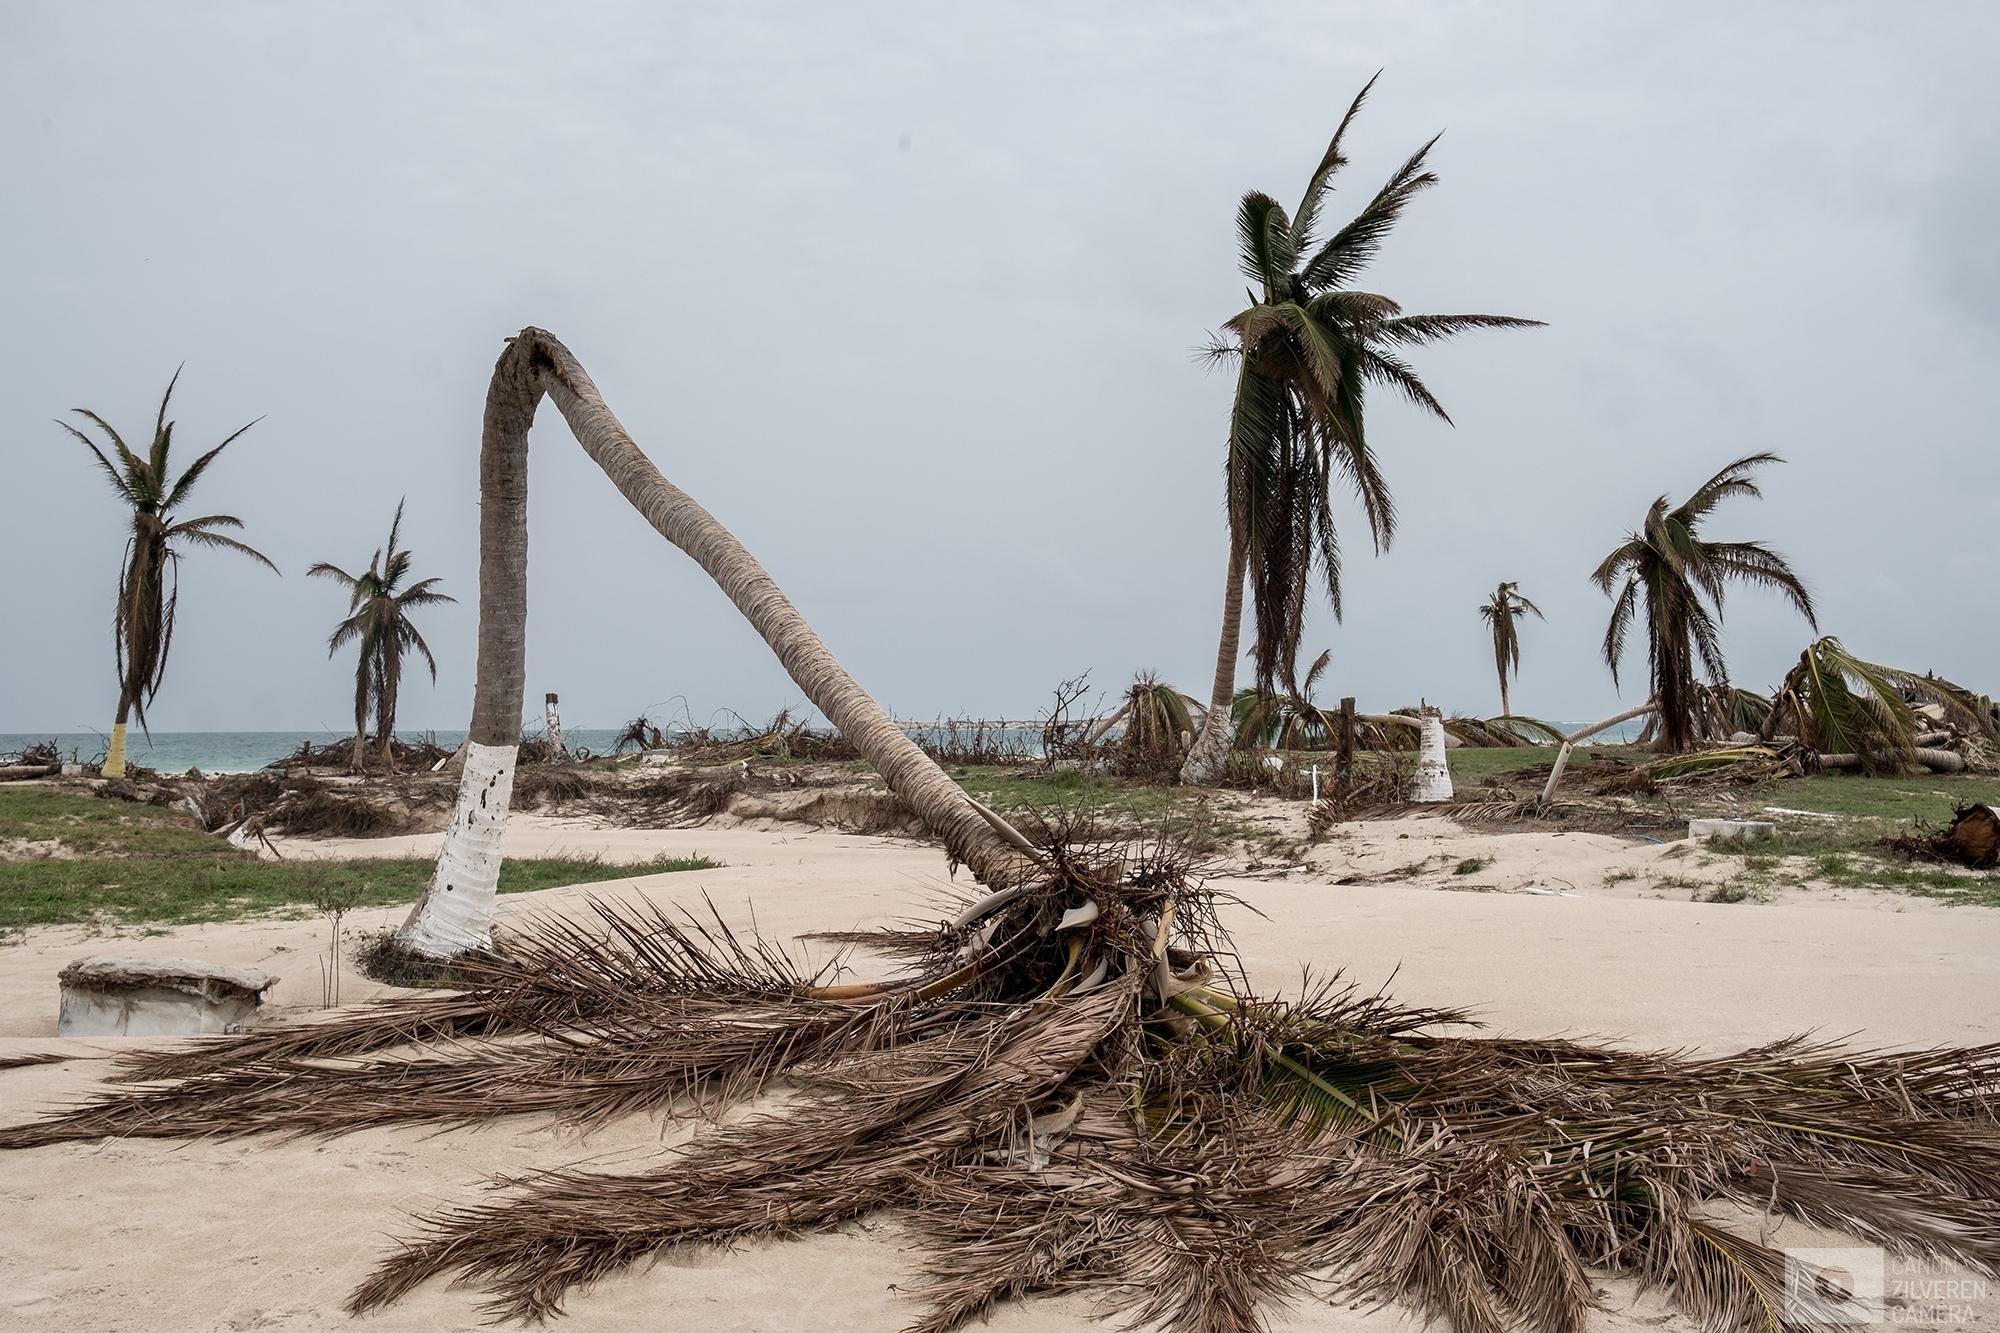 SINT MAARTEN | A broken down palm tree is seen on one of the many heavily damaged beaches of Sint Maarten. | #4